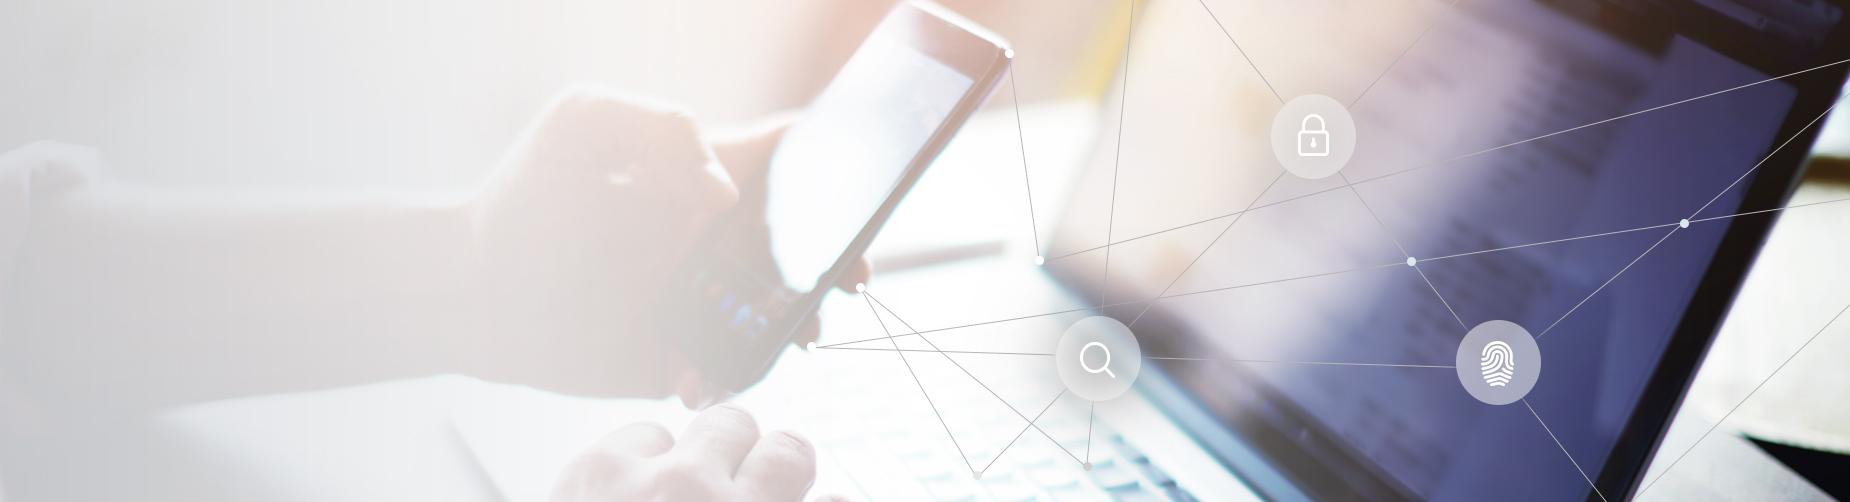 Data Security Ochrona danych i business continuity